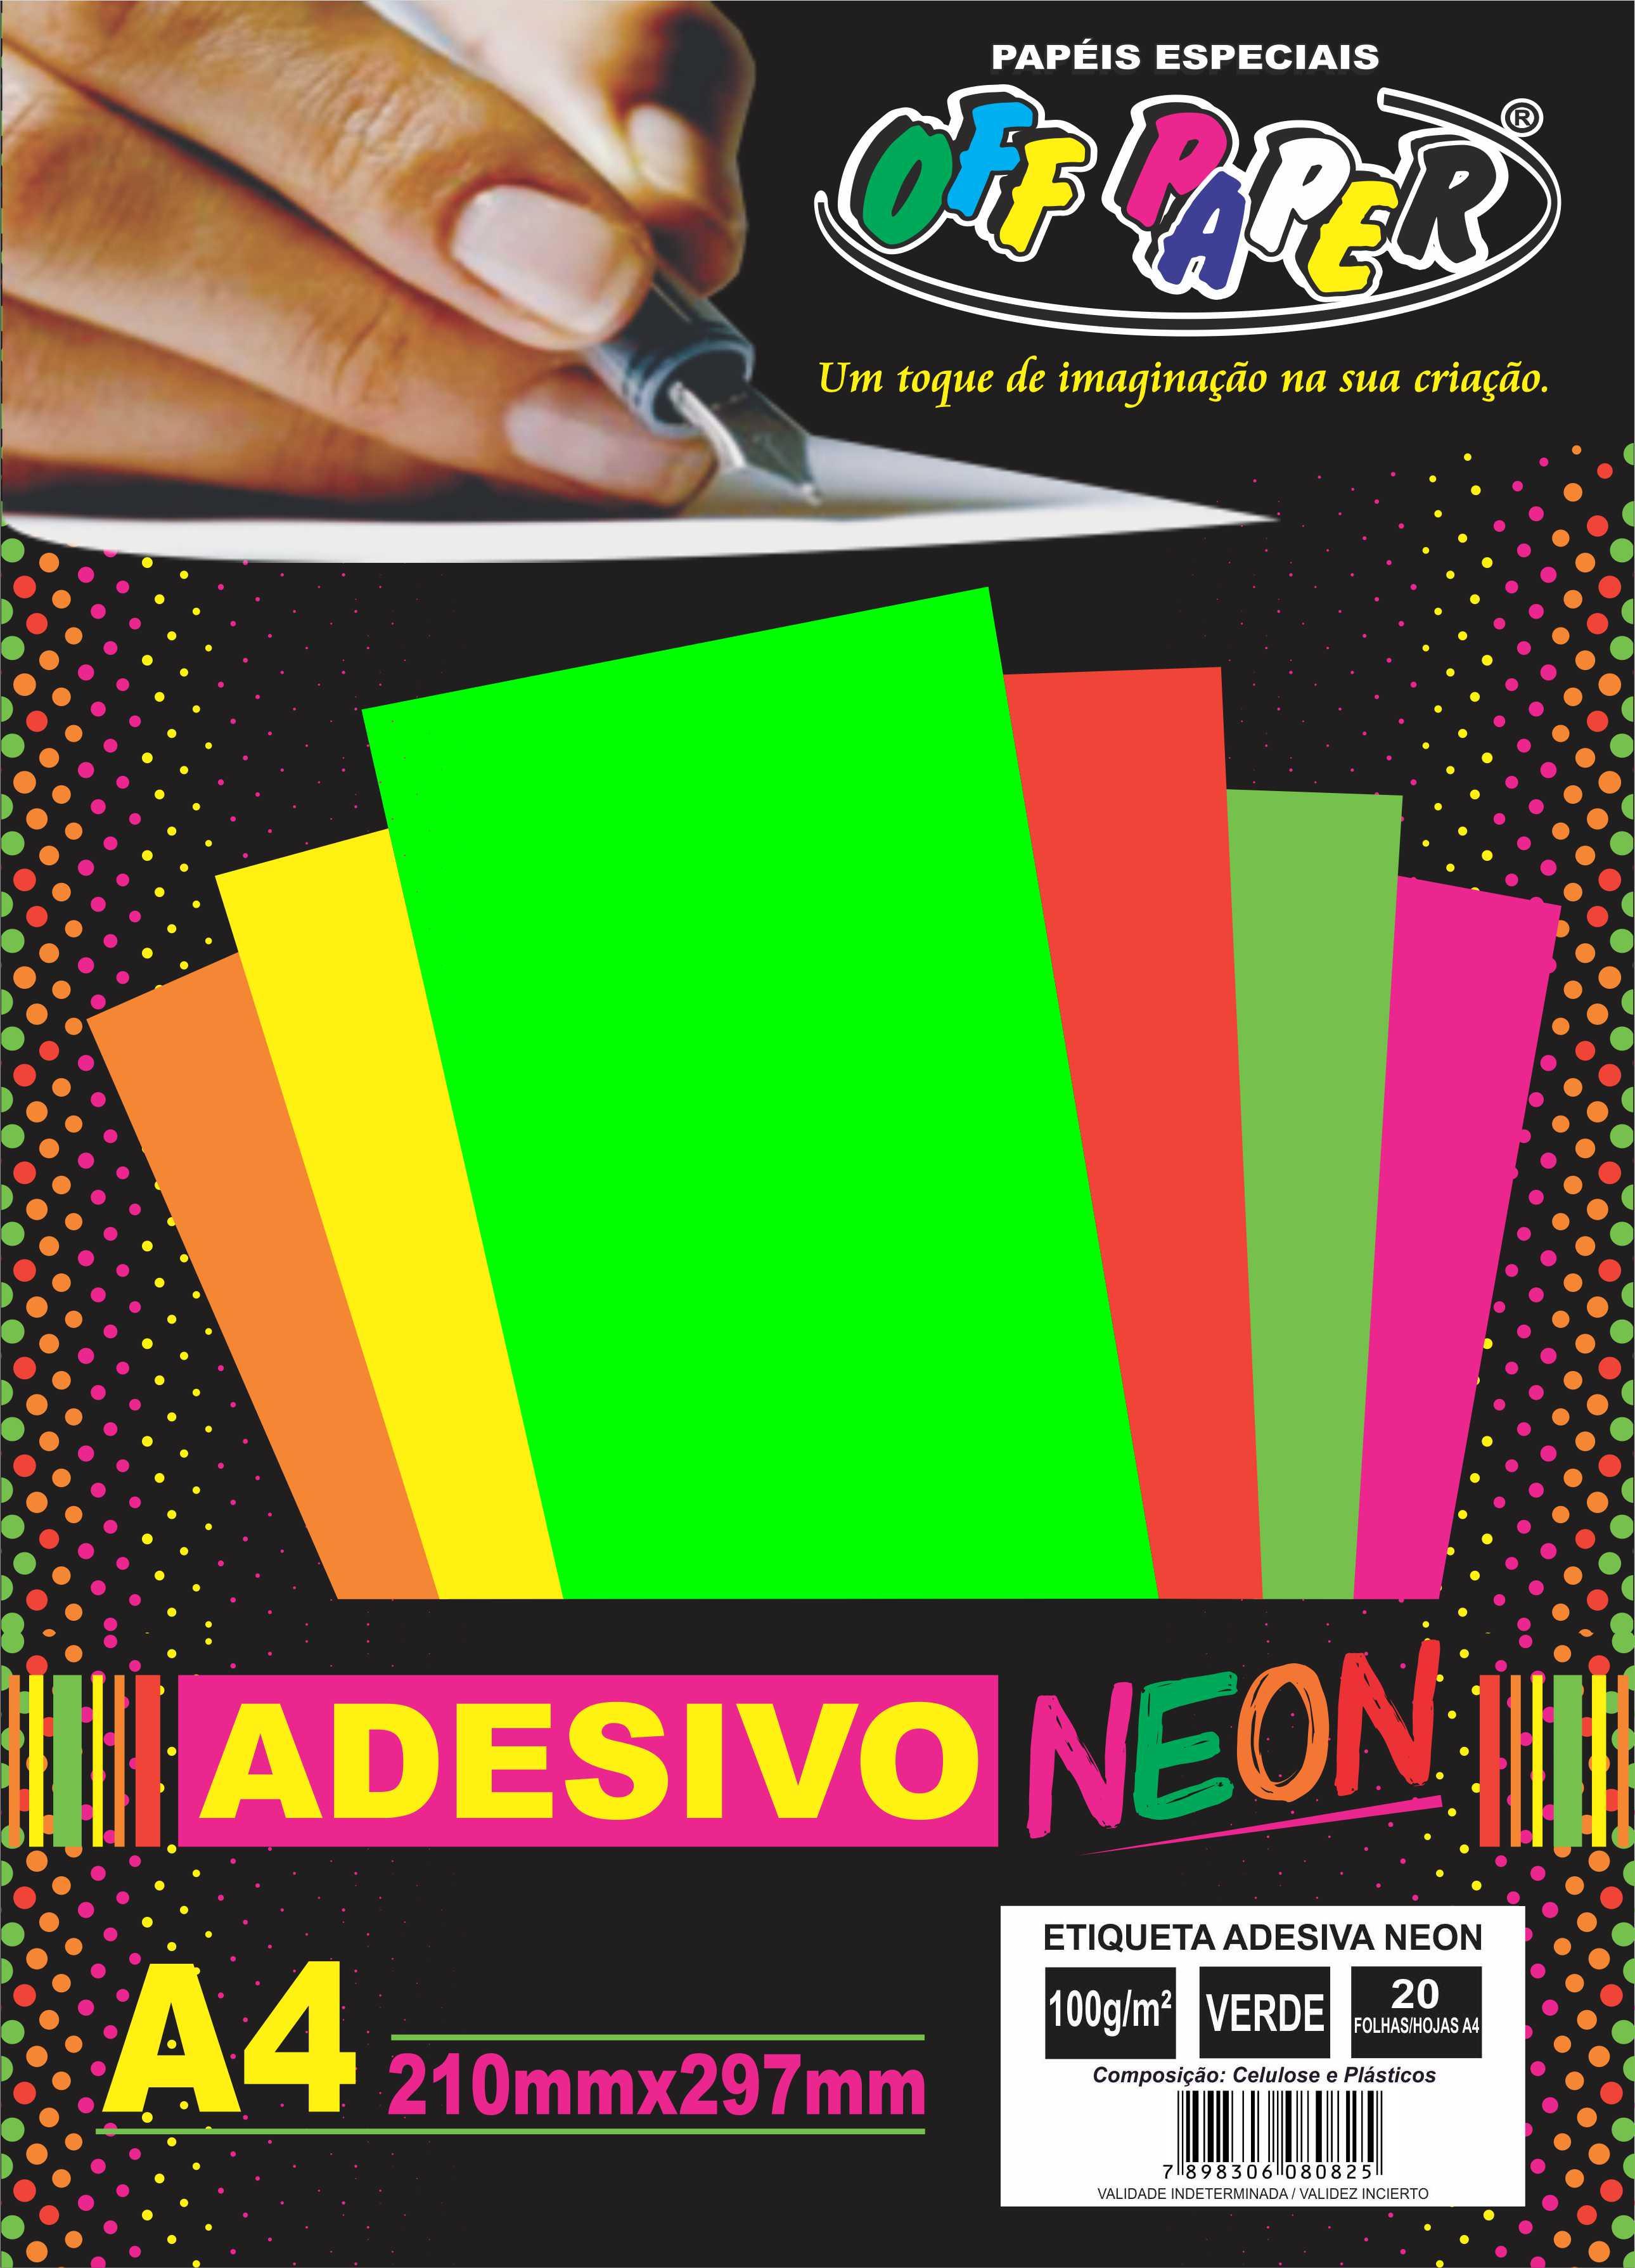 Adesivo Neon